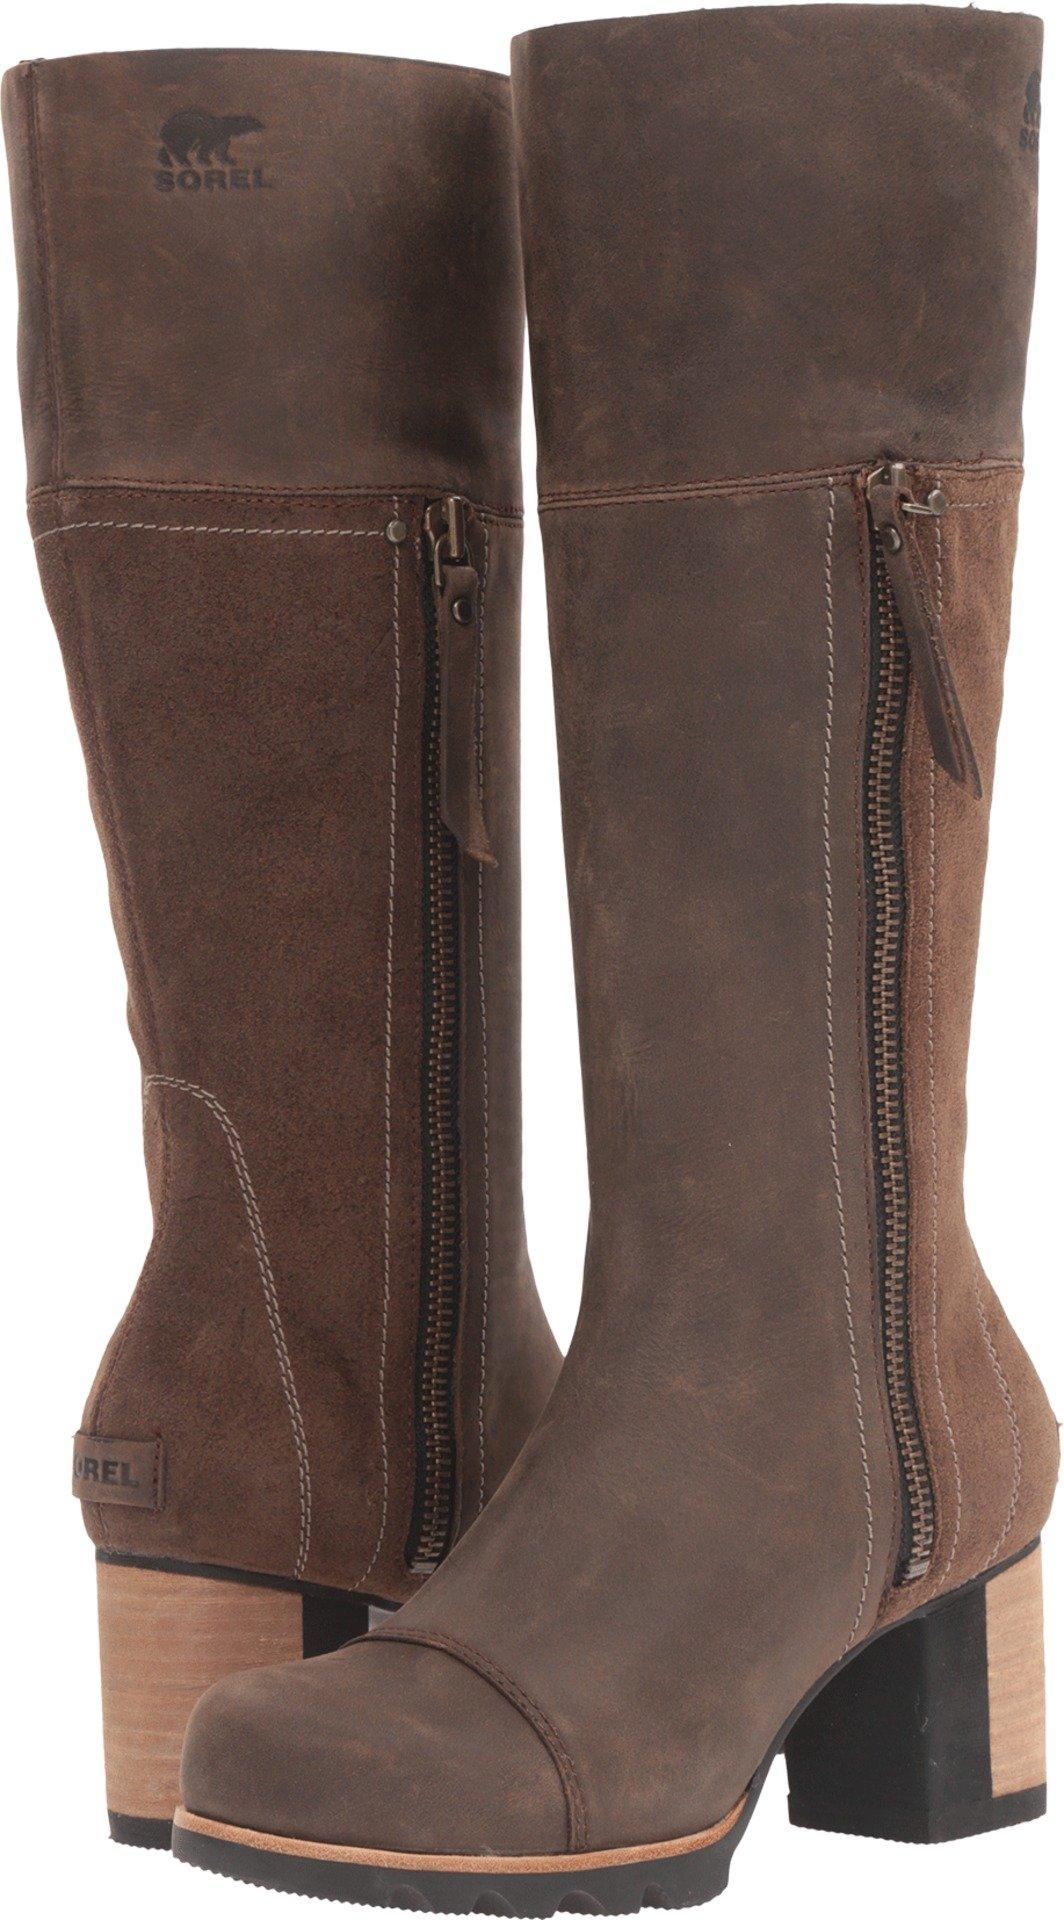 Sorel Addington Tall Boot - Women's Umber / Black 8.5 by SOREL (Image #1)